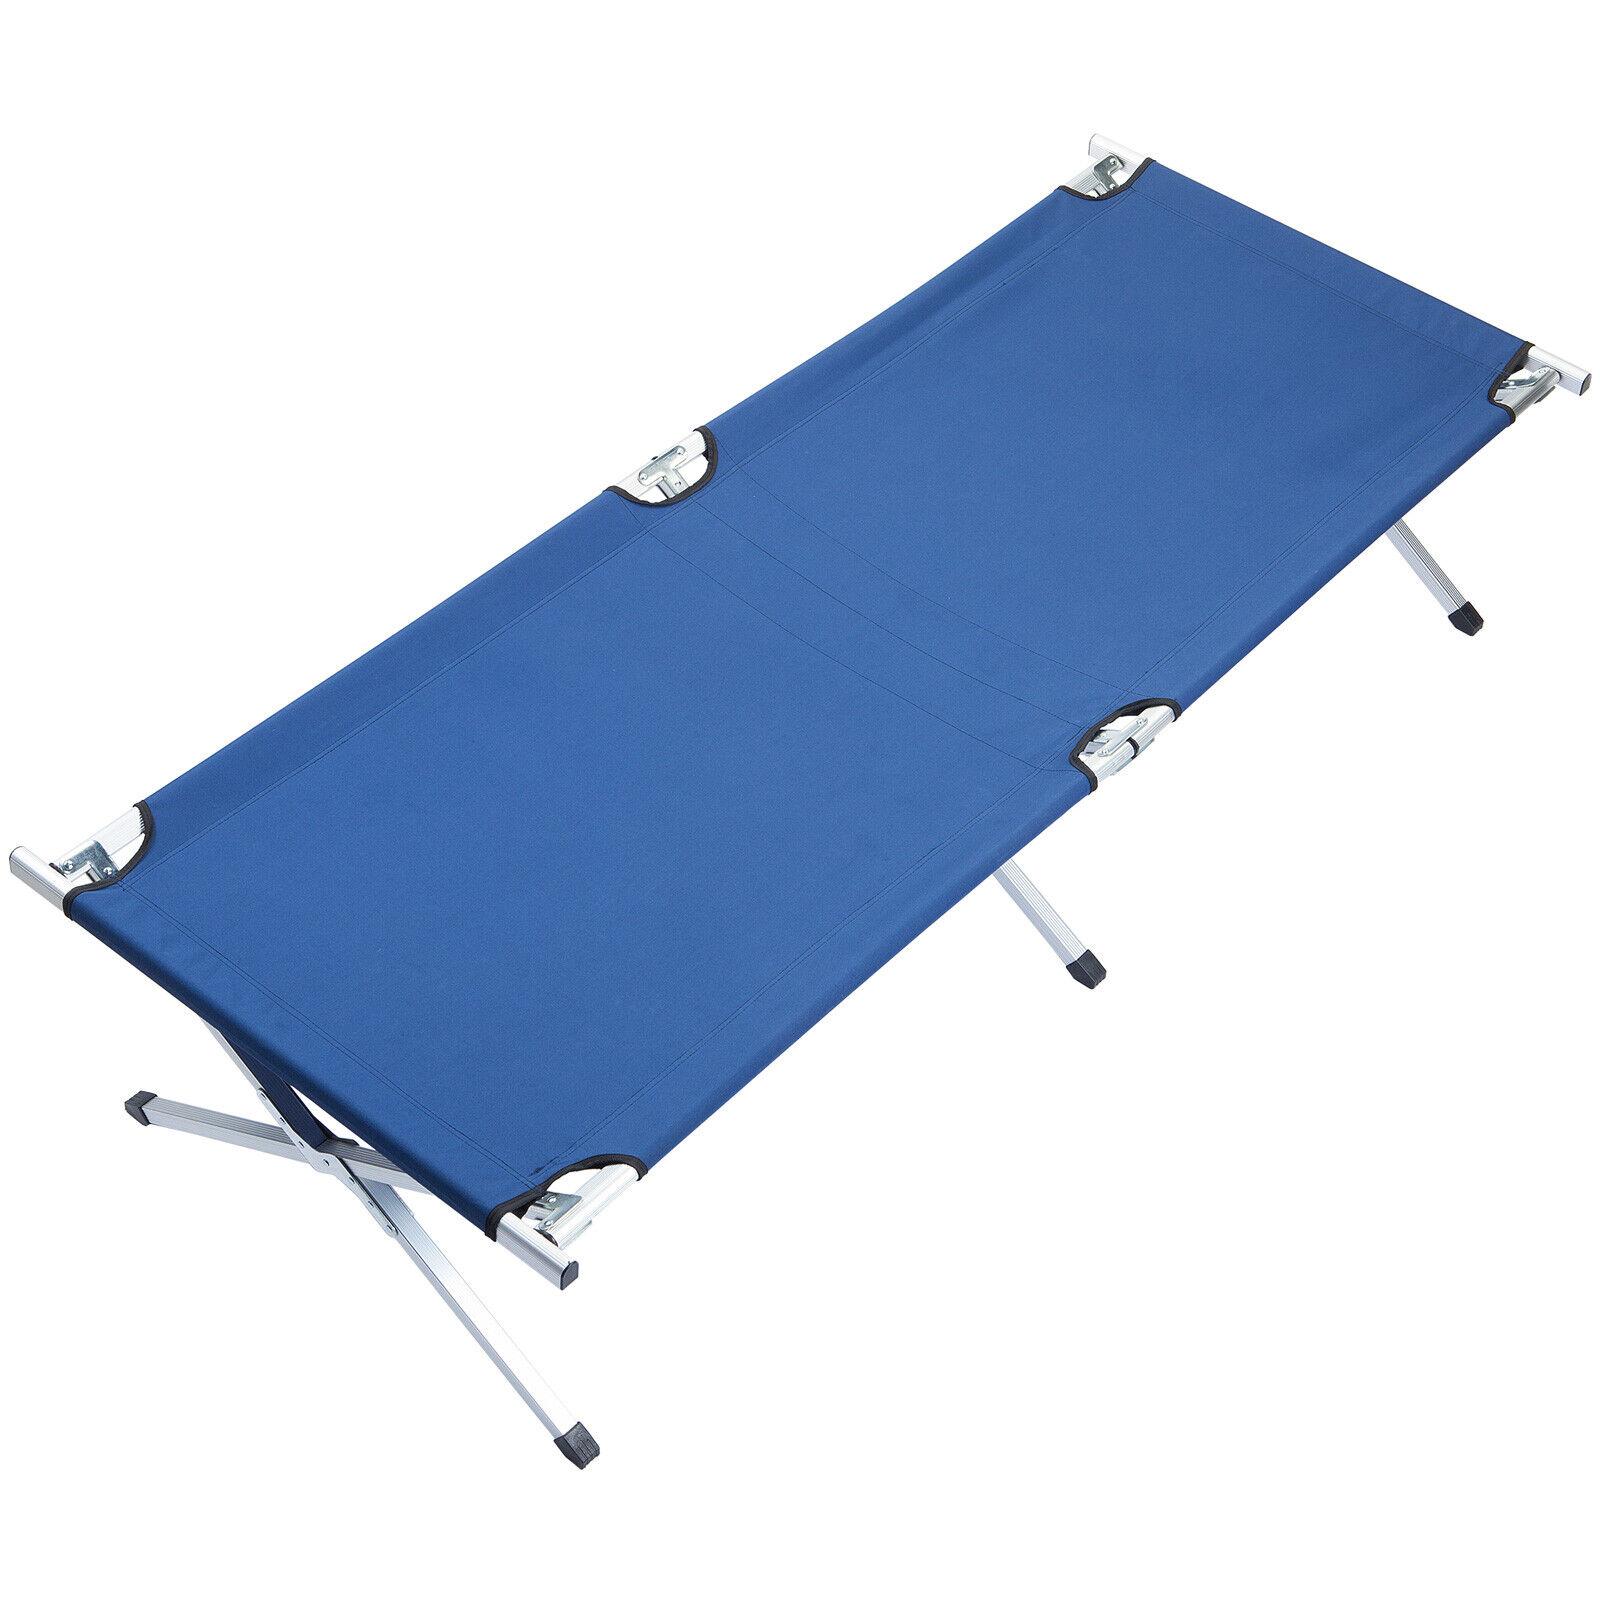 Skandika camatumbona camping aluminio 210x80cm 120 Kg plegable blu nueva